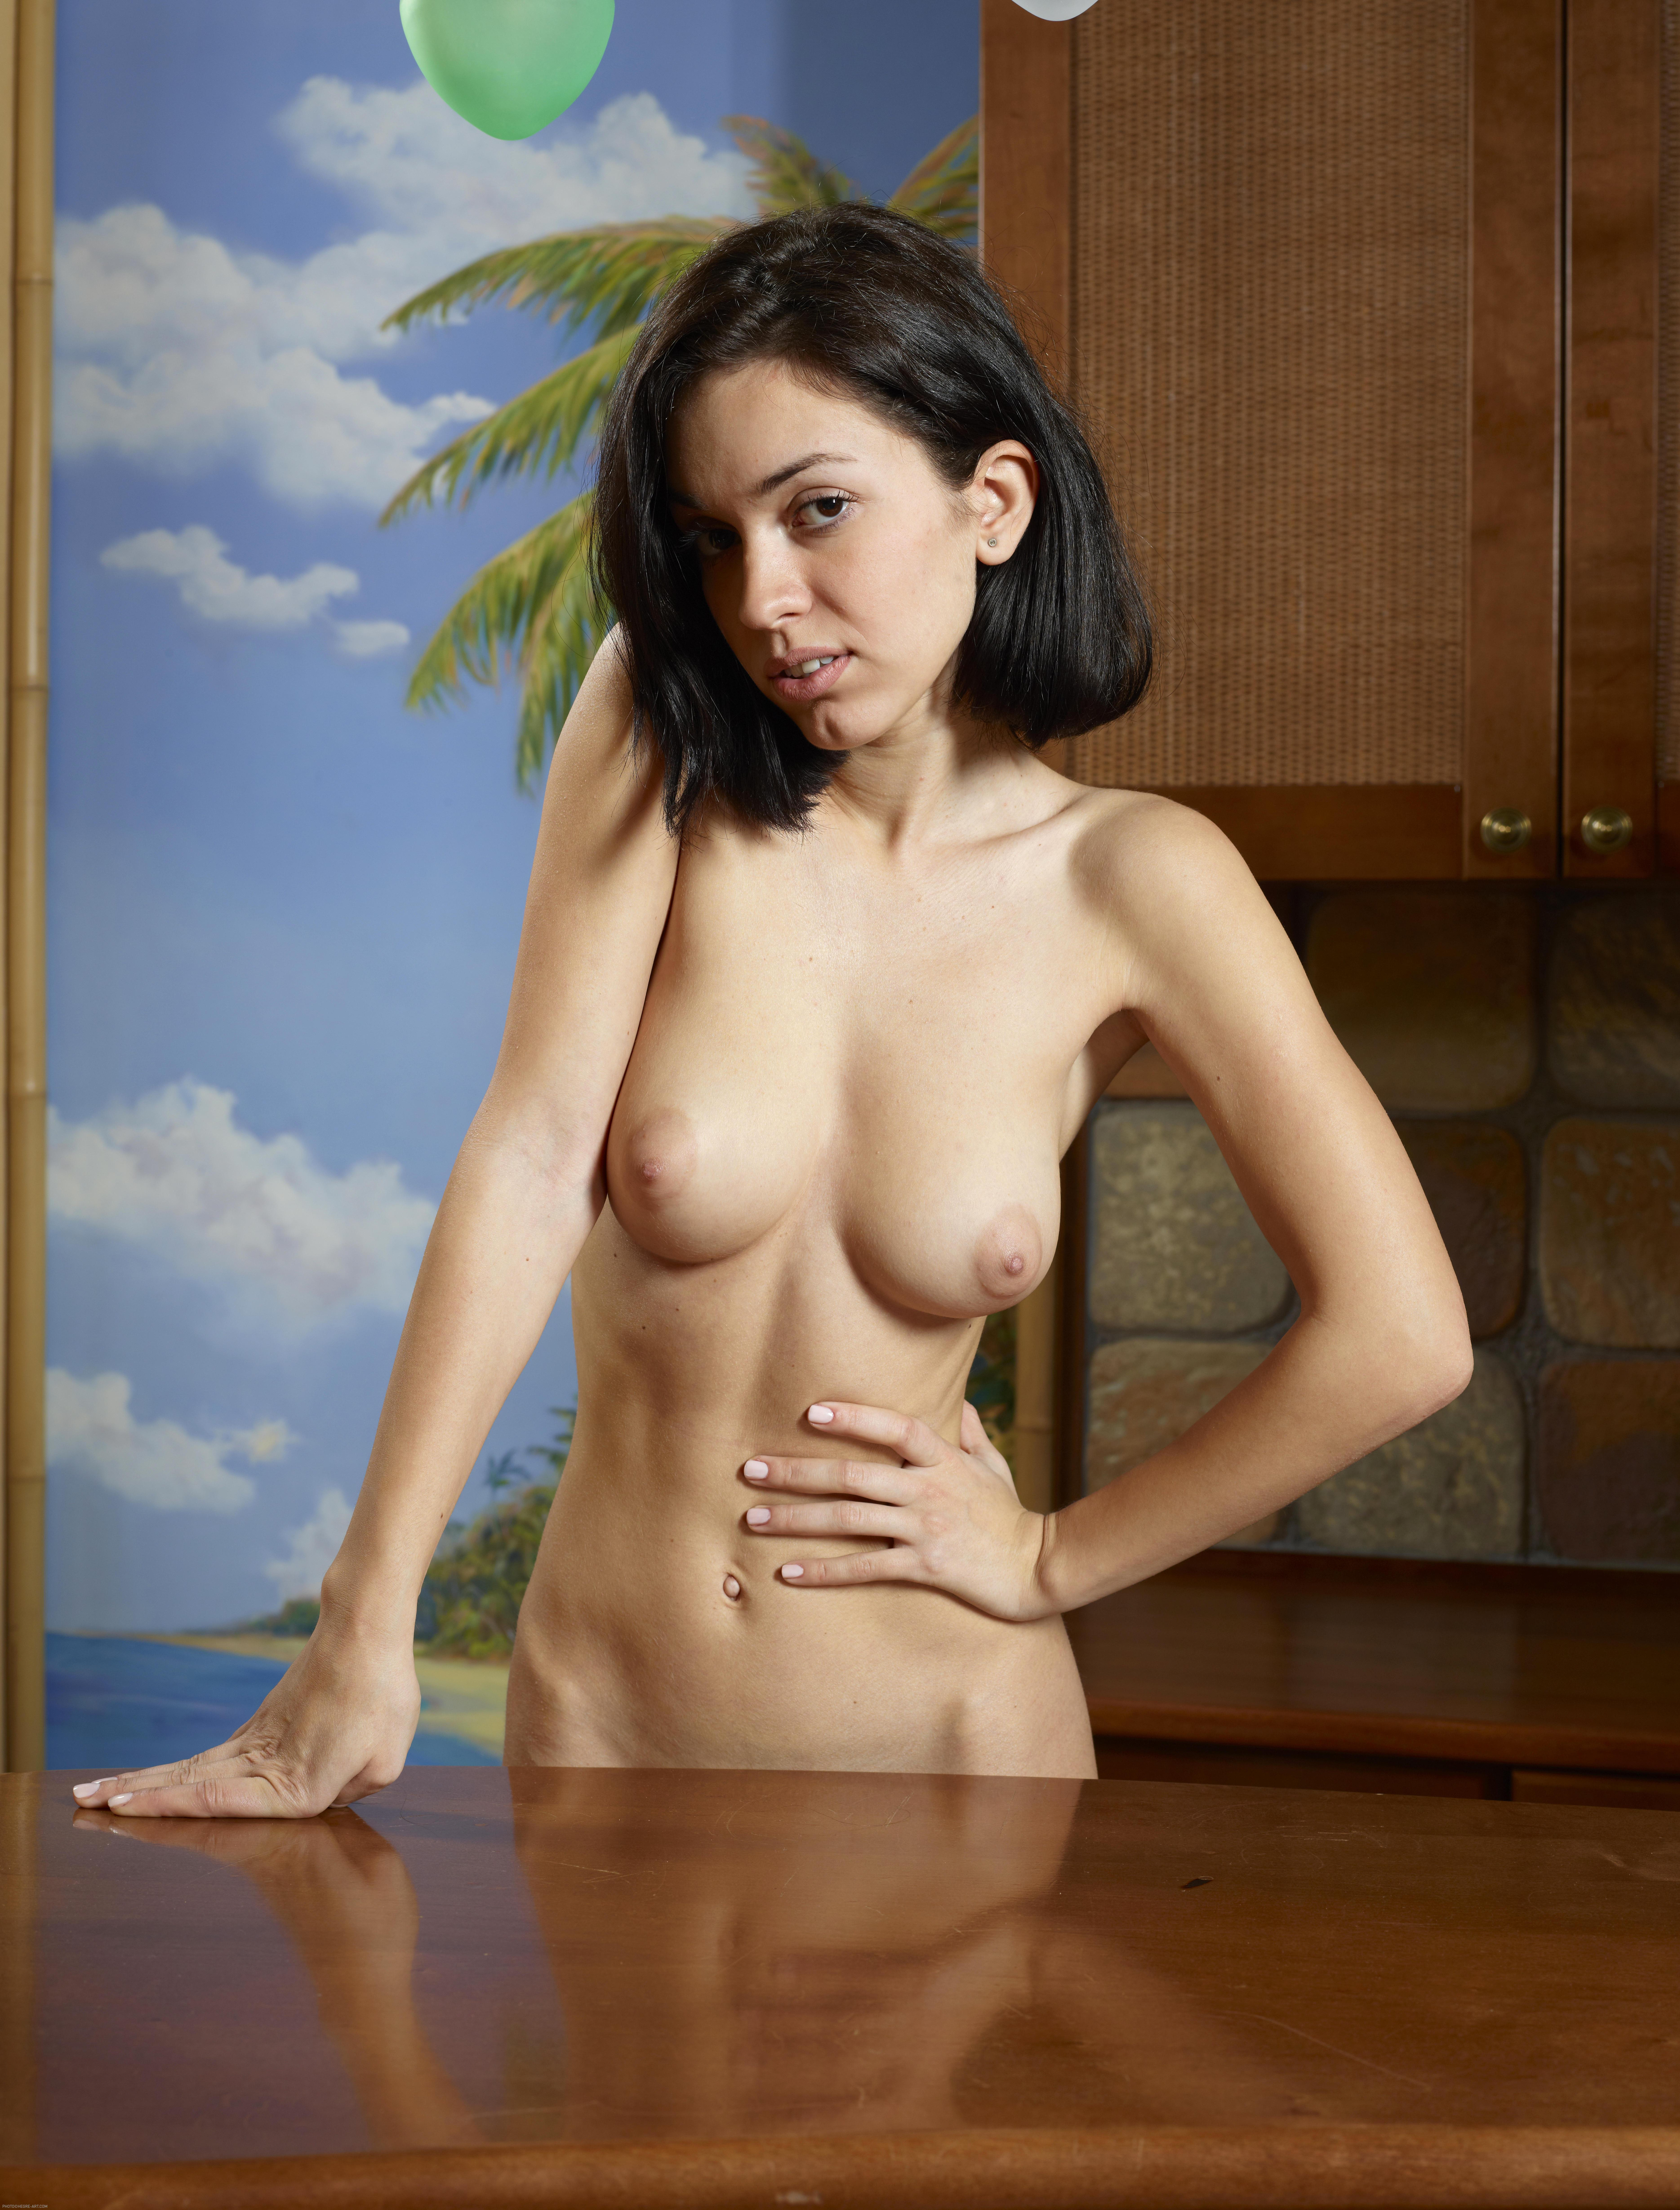 Nude usseek recommend look